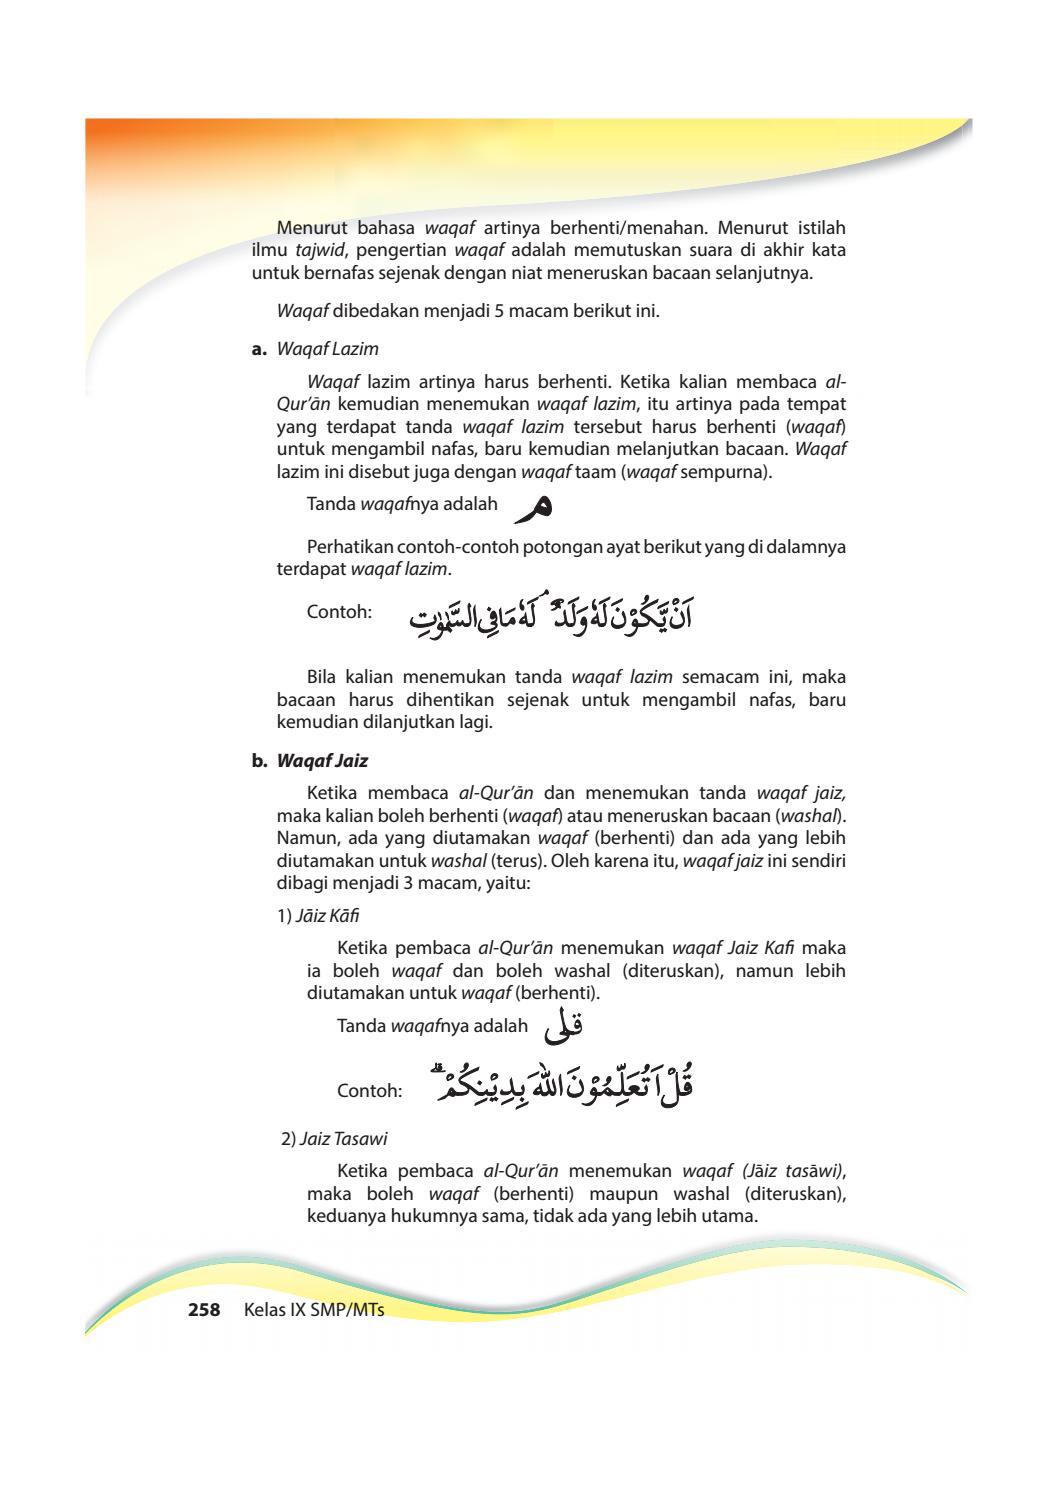 Contoh Bacaan Waqaf Lazim : contoh, bacaan, waqaf, lazim, Kelas, Pendidikan, Agama, Islam, Pekerti, Siswa, Issuu